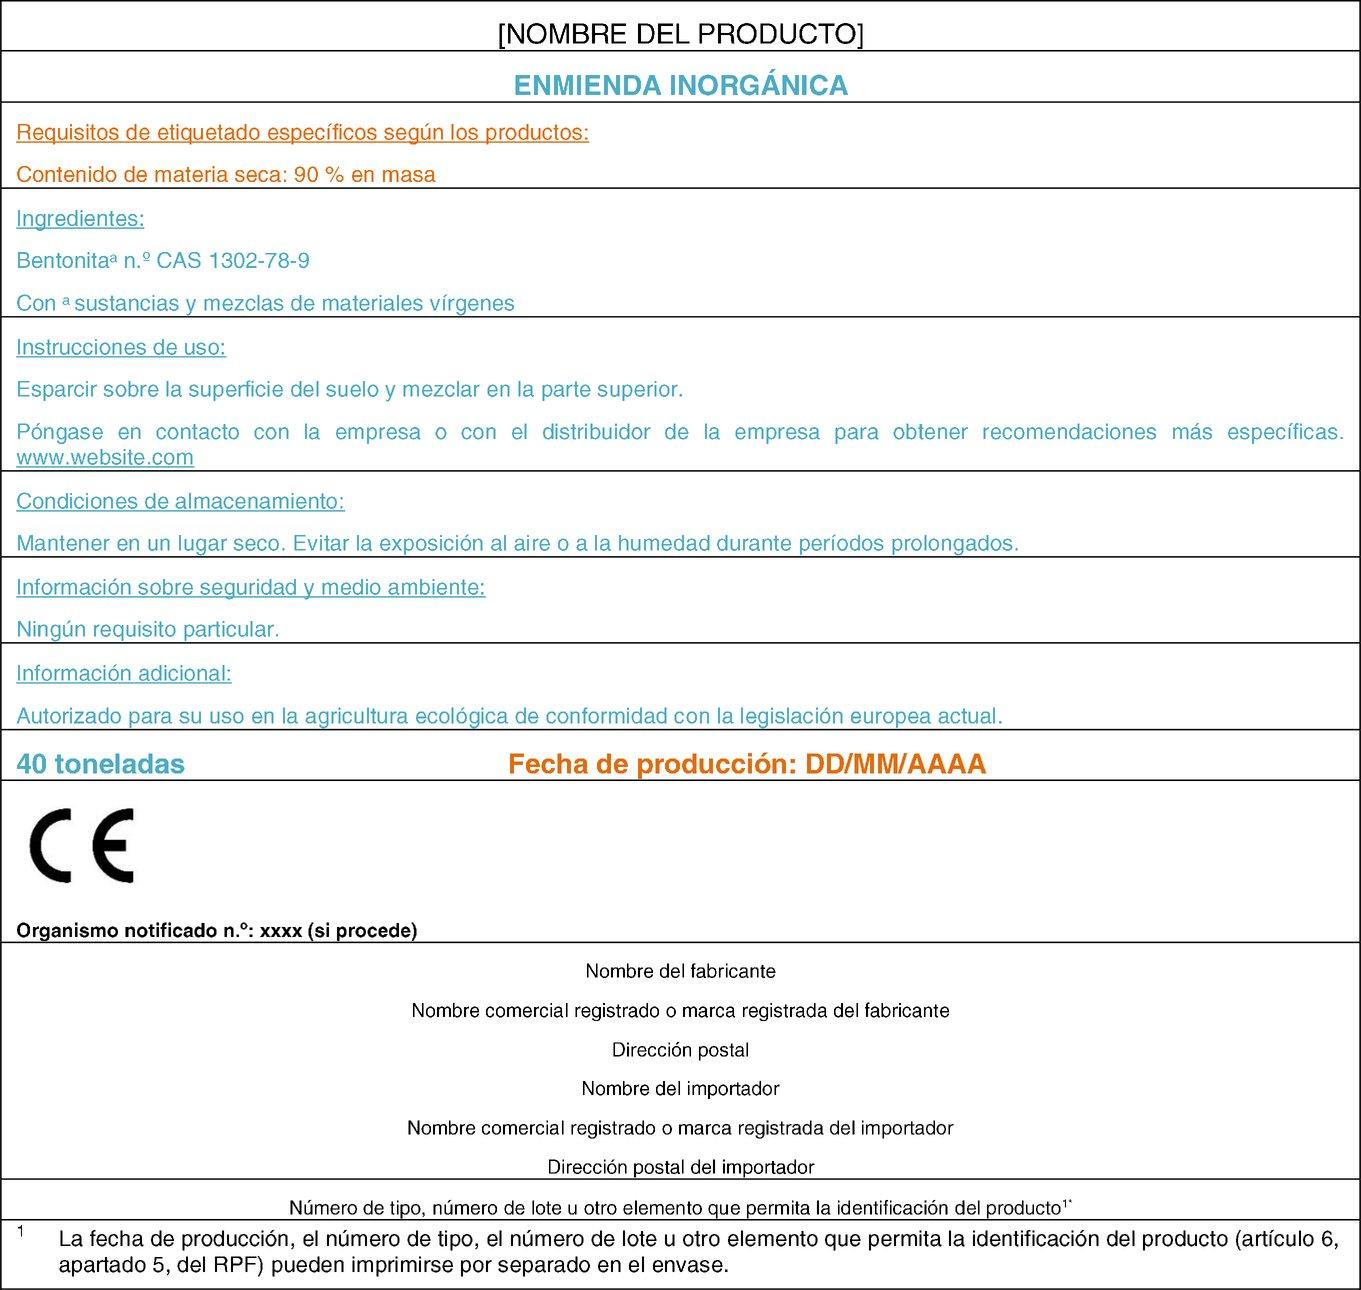 Imagen: http://publications.europa.eu/resource/uriserv/OJ.C_.2021.119.01.0001.01.SPA.xhtml.C_2021119ES.01002901.tif.jpg